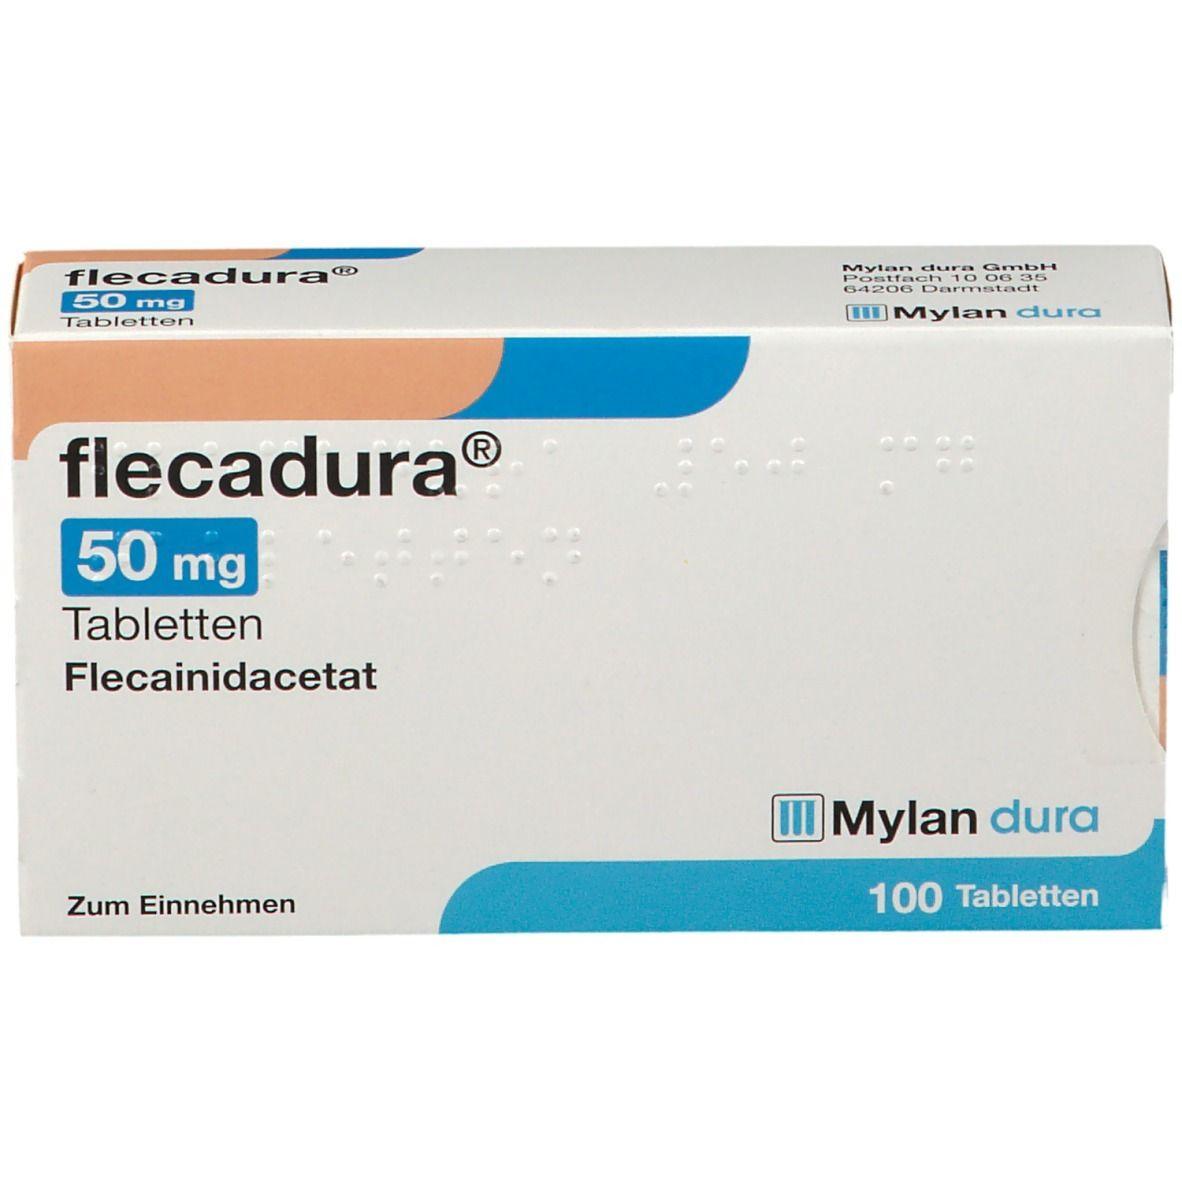 Flecadura 50 mg Tabletten